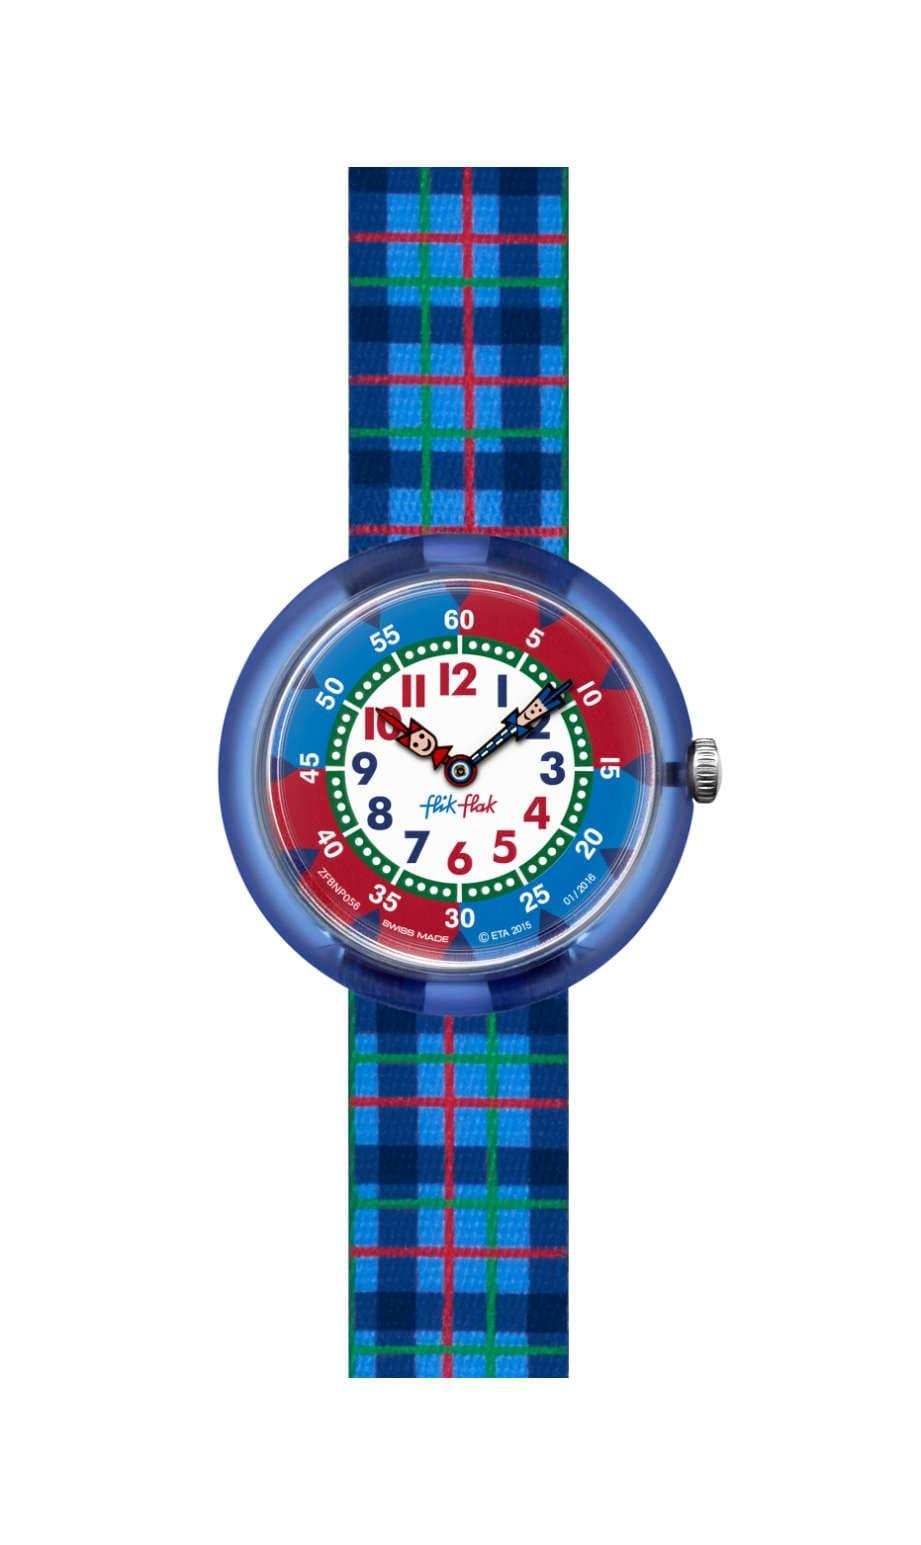 Swatch - BLUE FLIK - 1